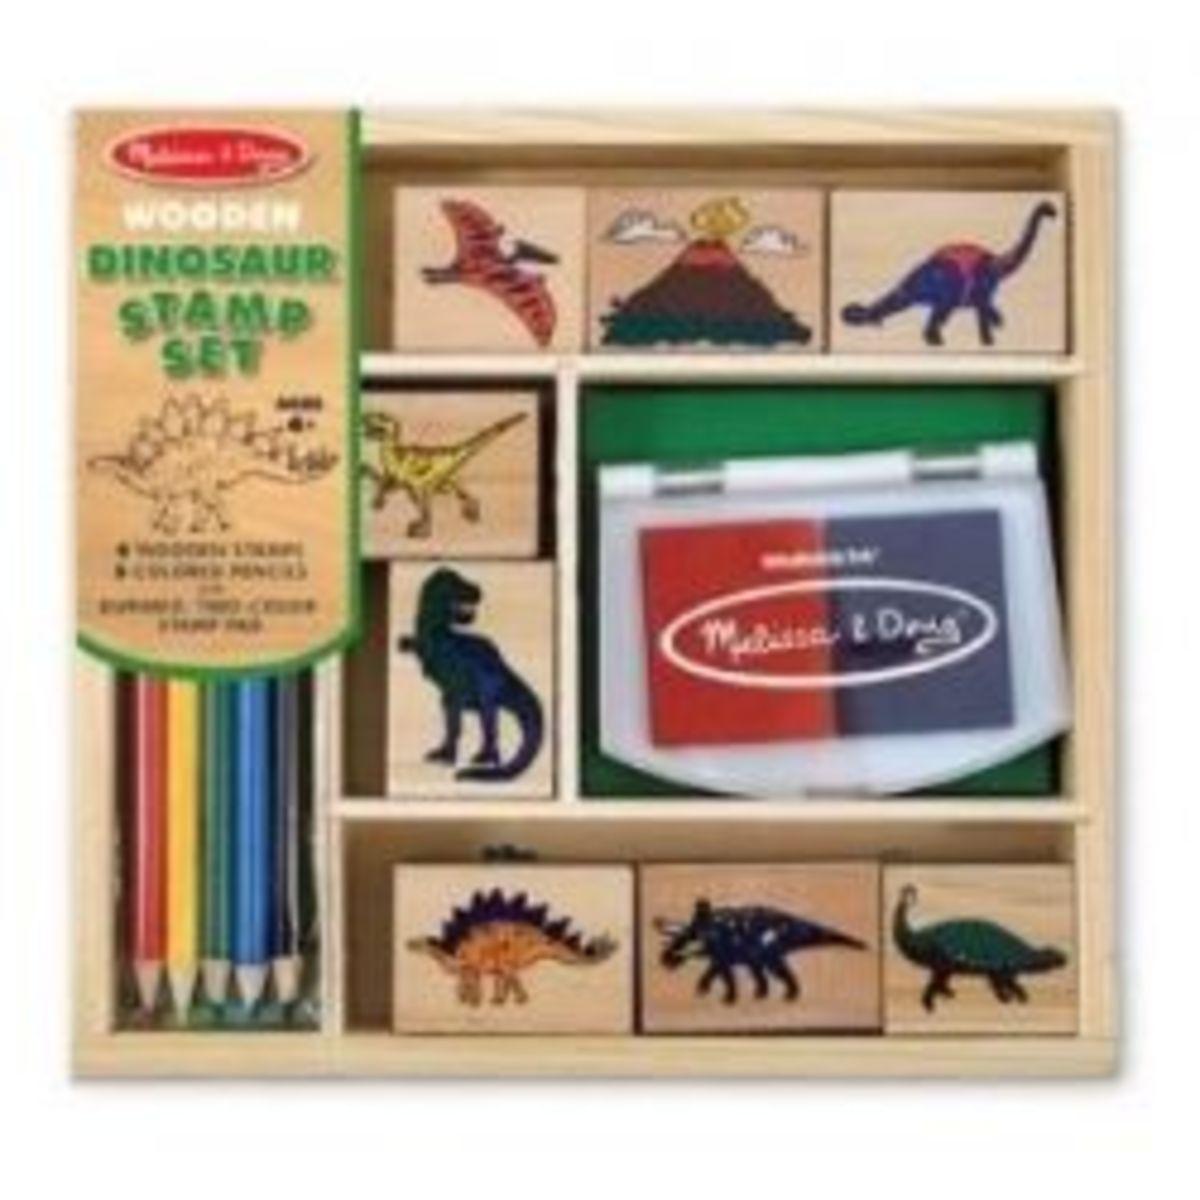 Dinosaur Stamp Set - only $7.99!!!